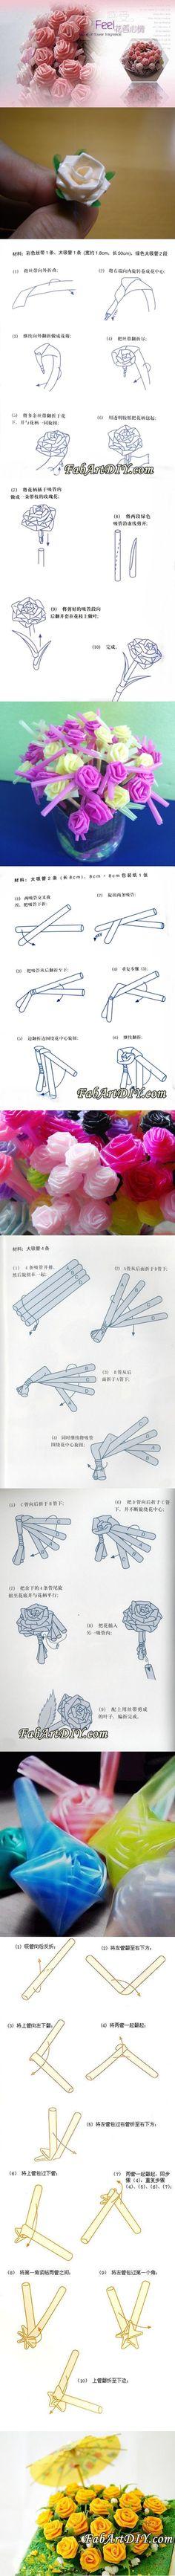 DIY Roses from Drinking Straw in 4 Ways | www.FabArtDIY.com LIKE Us on Facebook ==> https://www.facebook.com/FabArtDIY